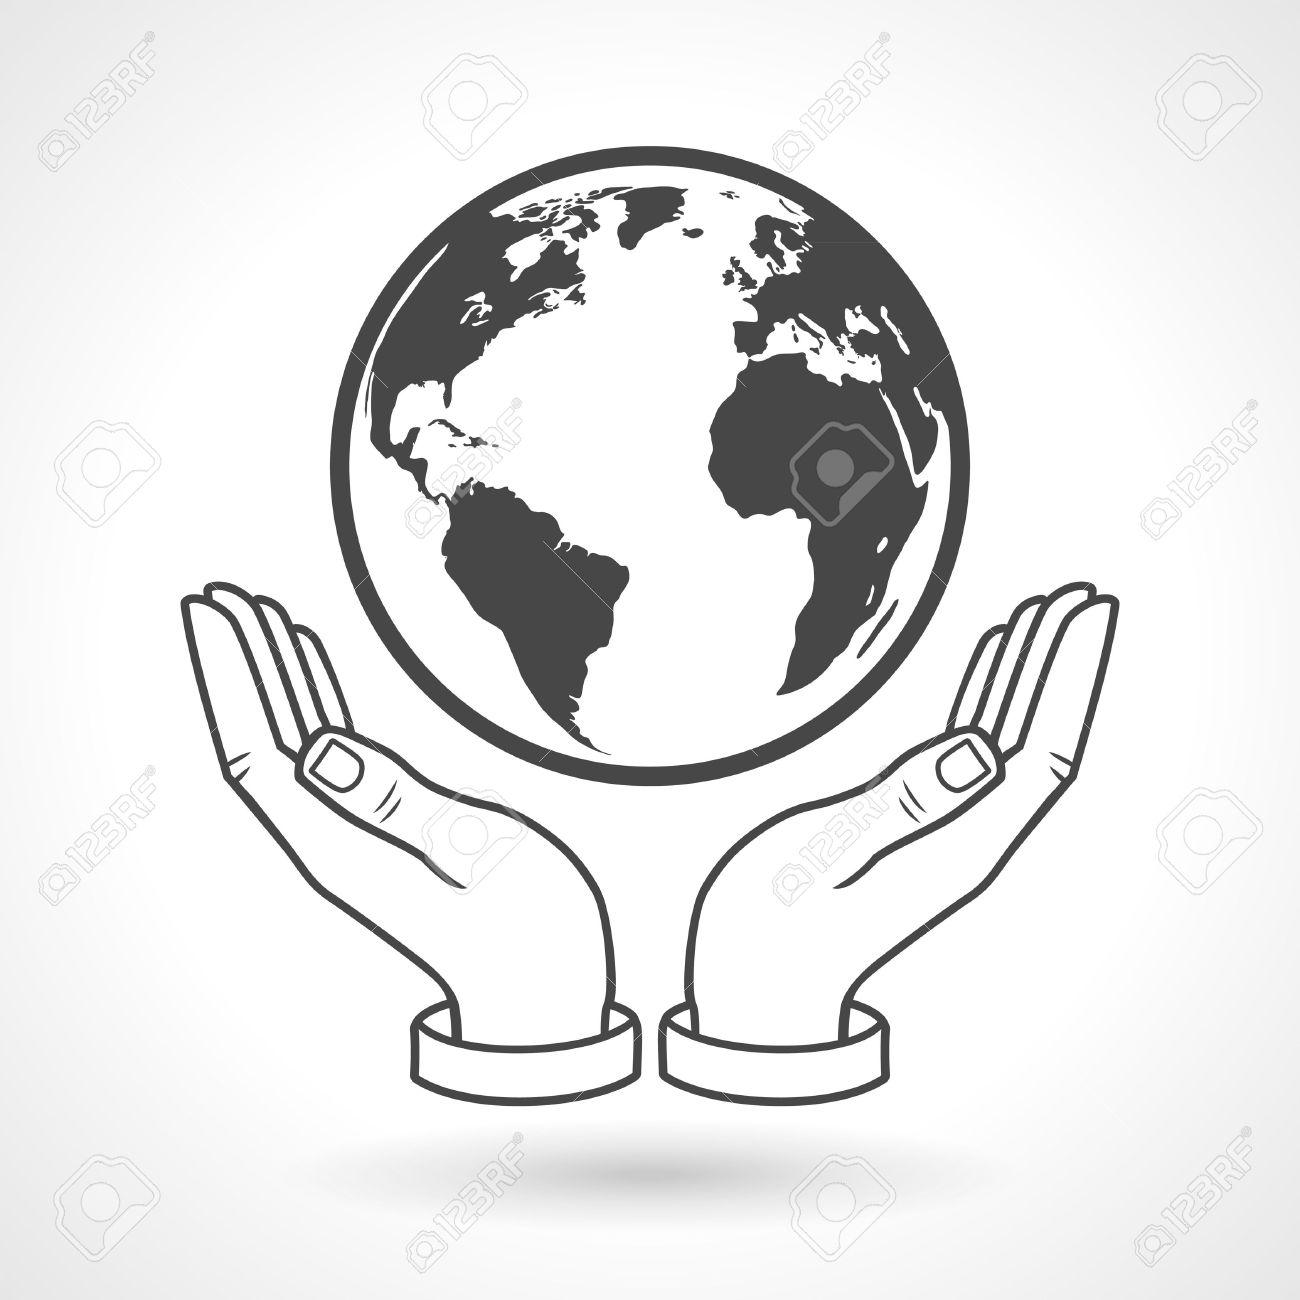 1300x1300 Hands Holding Earth Globe Symbol Royalty Free Cliparts, Vectors